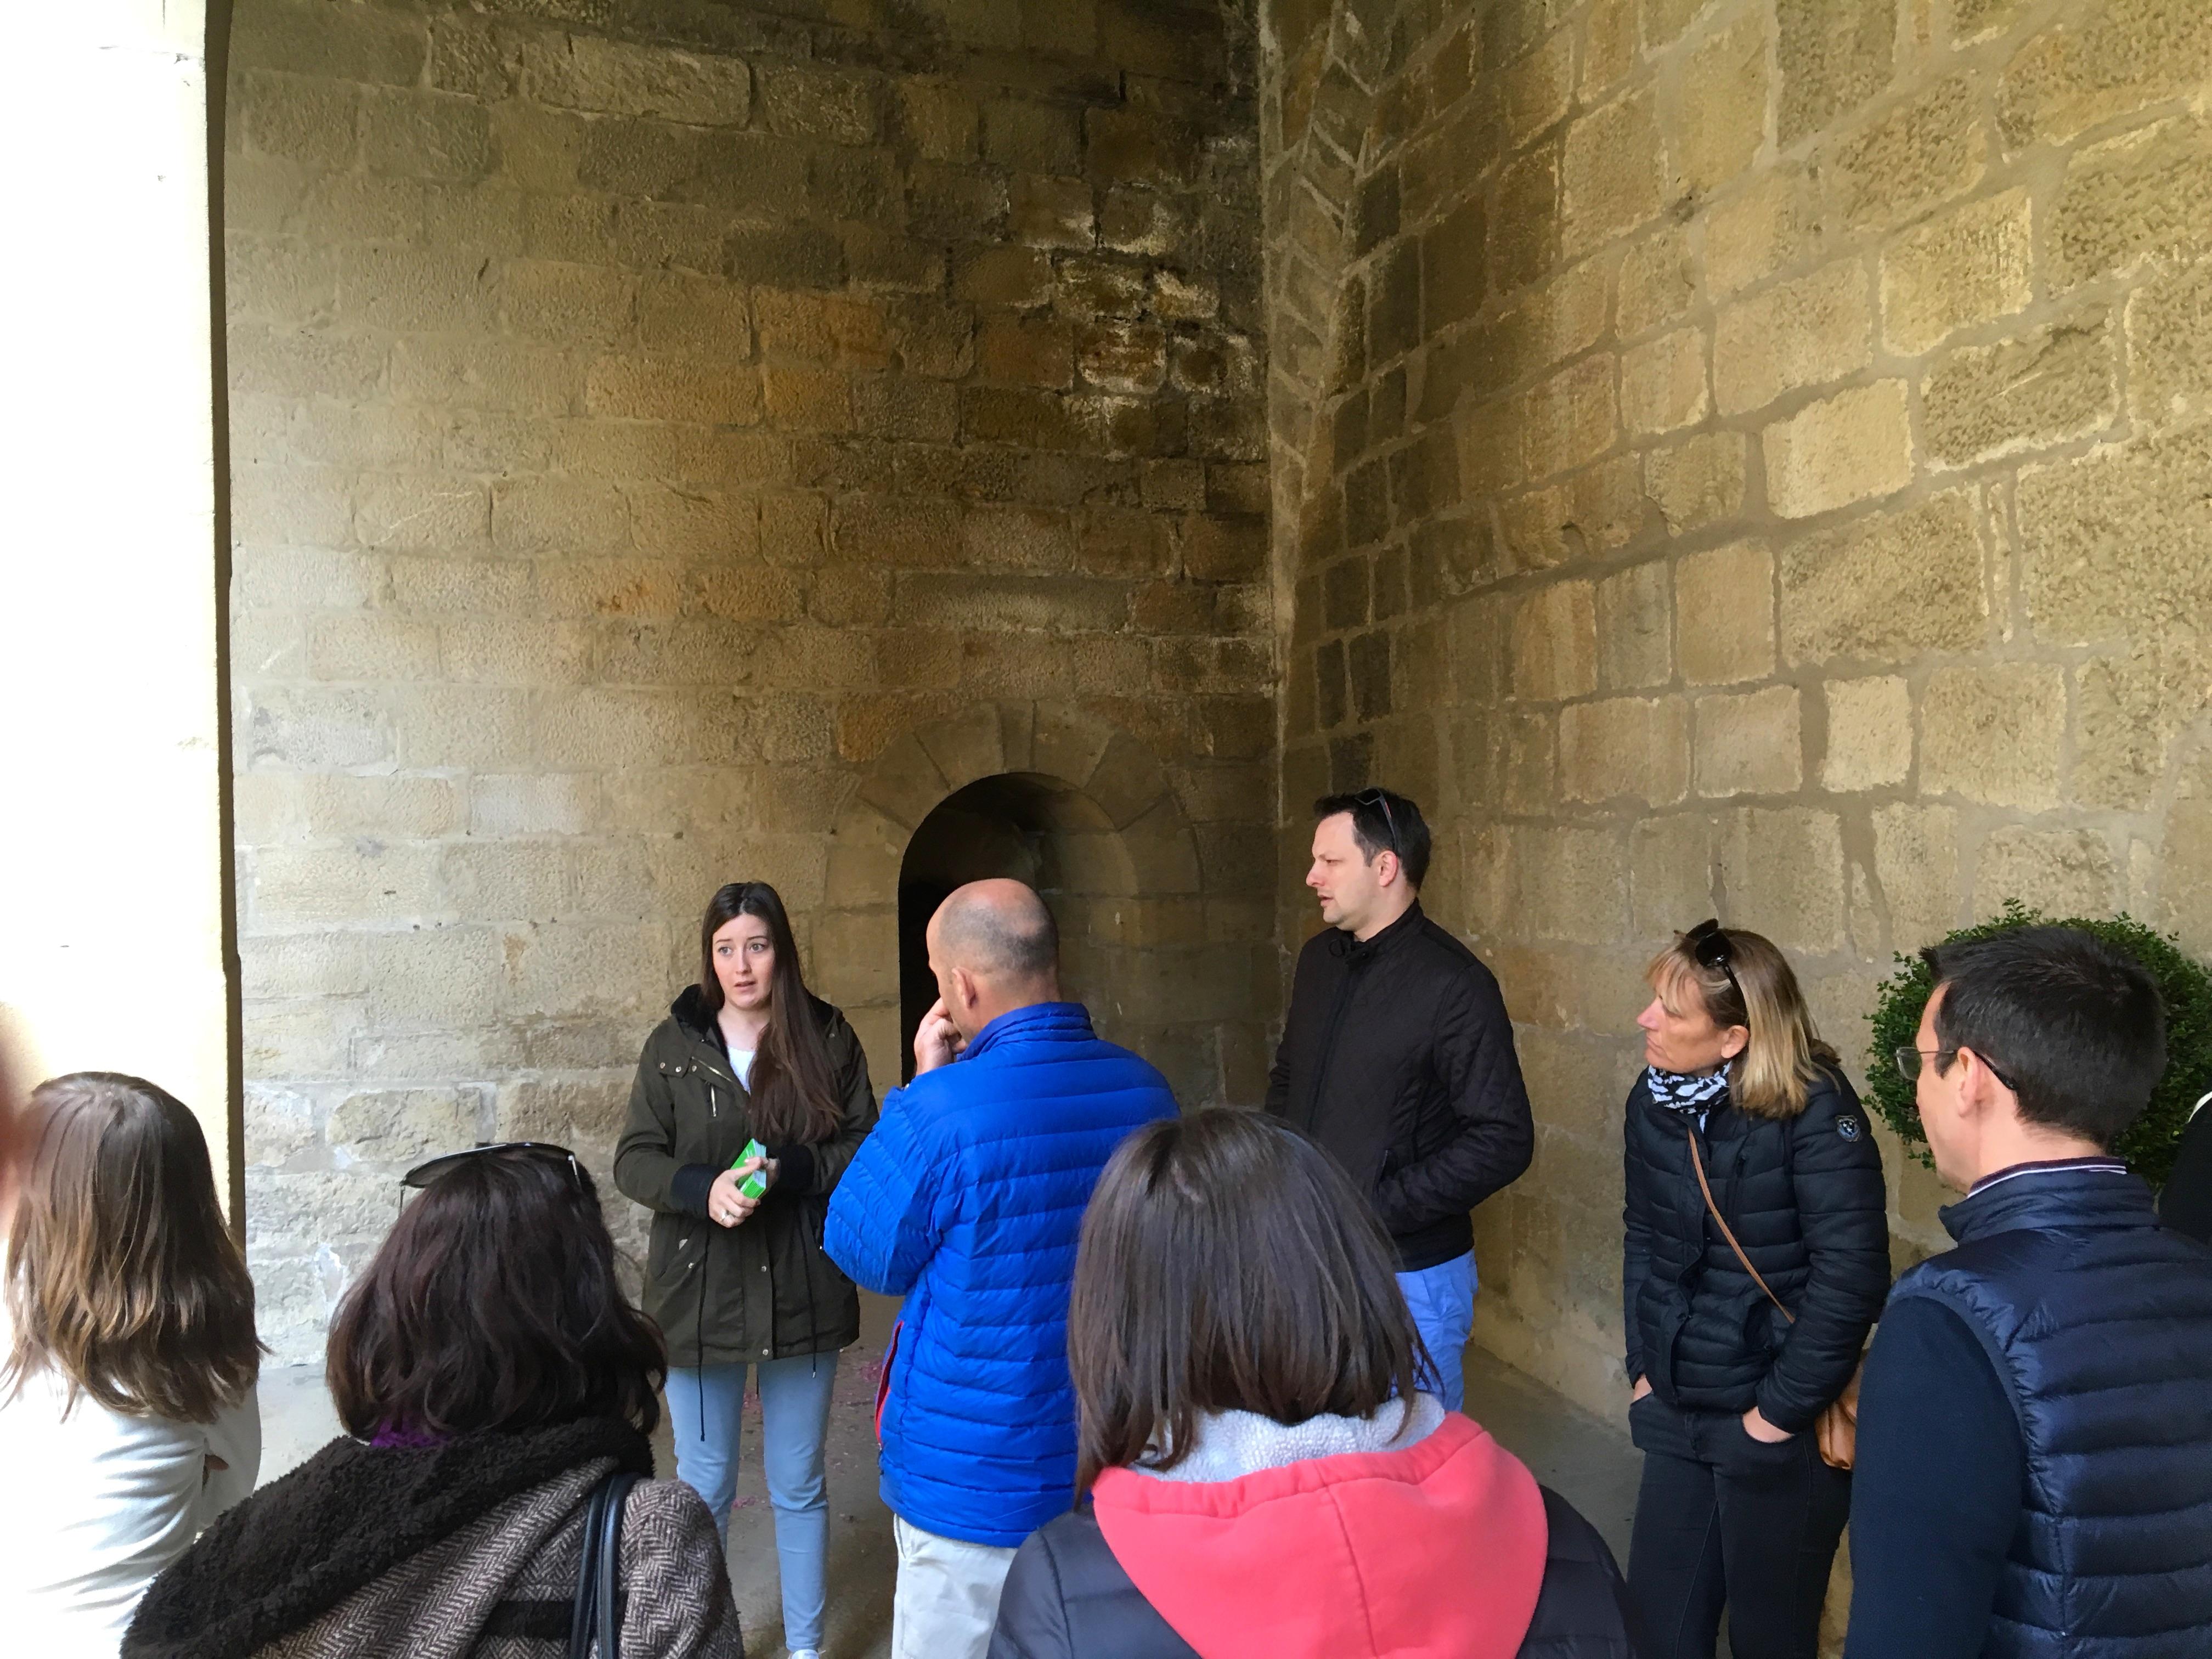 Incentive séminaire pampelune radonnée pays basque navarre bodega quad bardenas olite grottes troglodytes cuevas agence evenementielle erronda